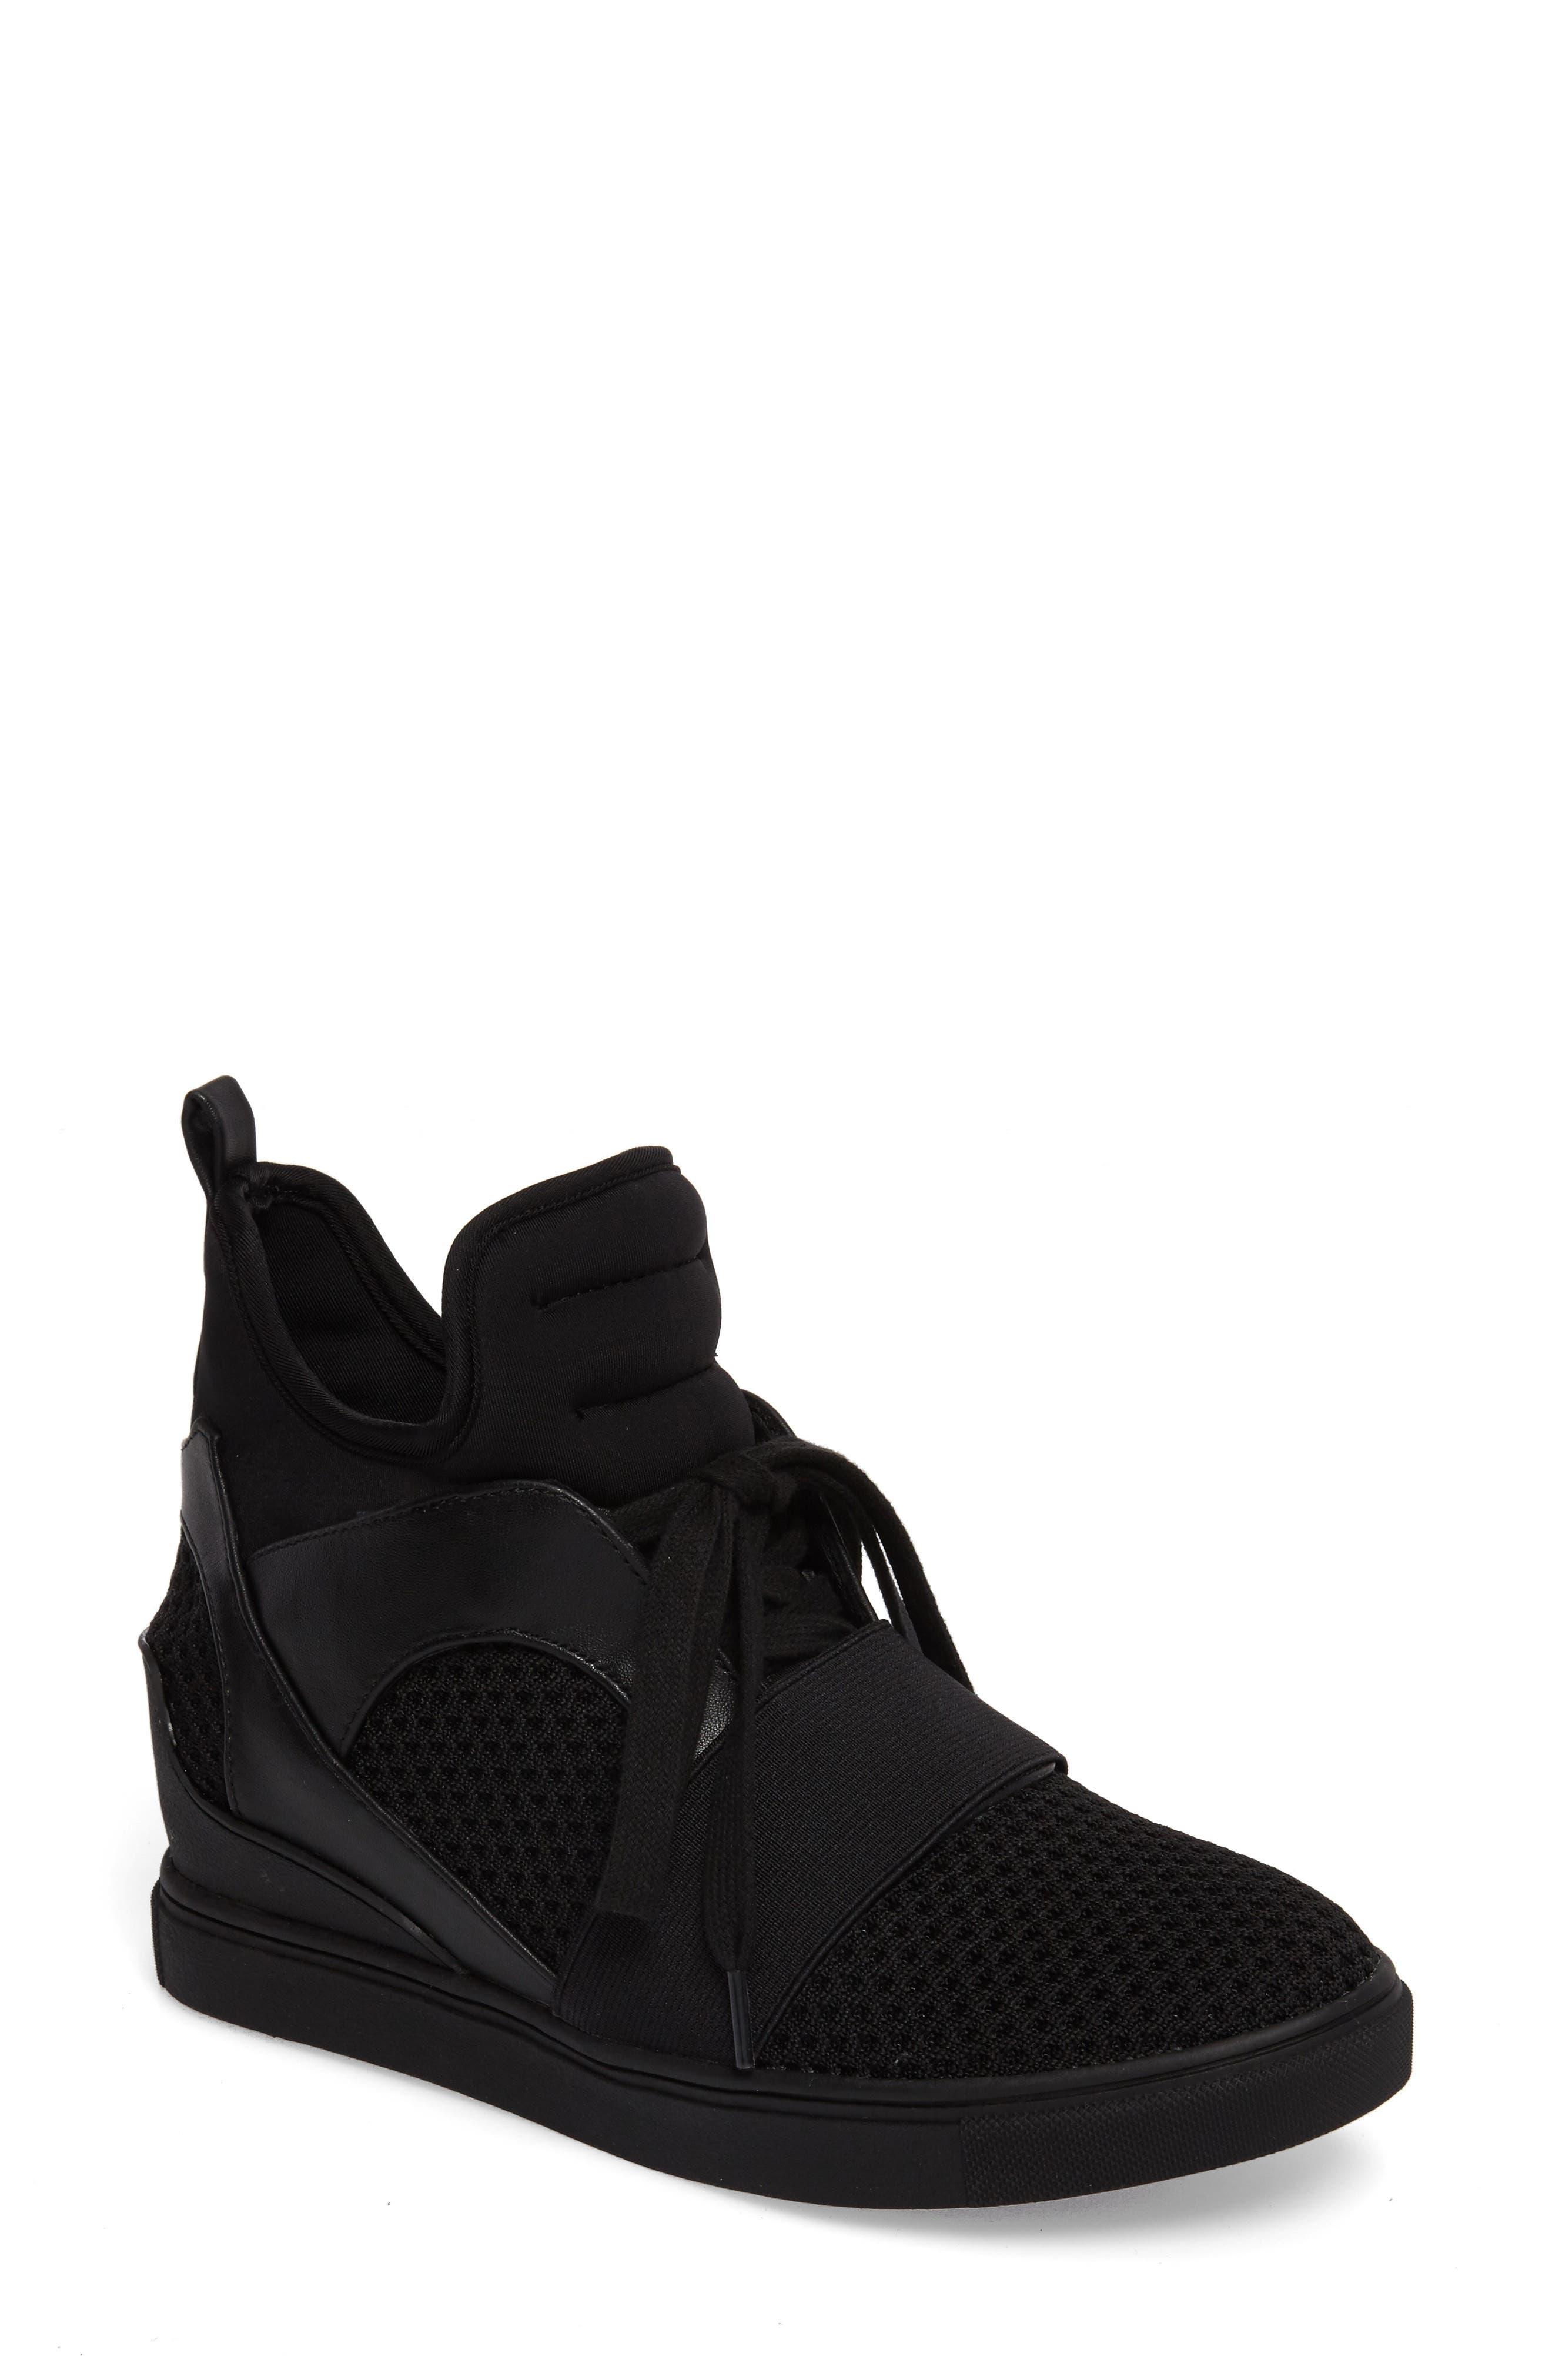 Lexie Wedge Sneaker,                             Main thumbnail 1, color,                             001